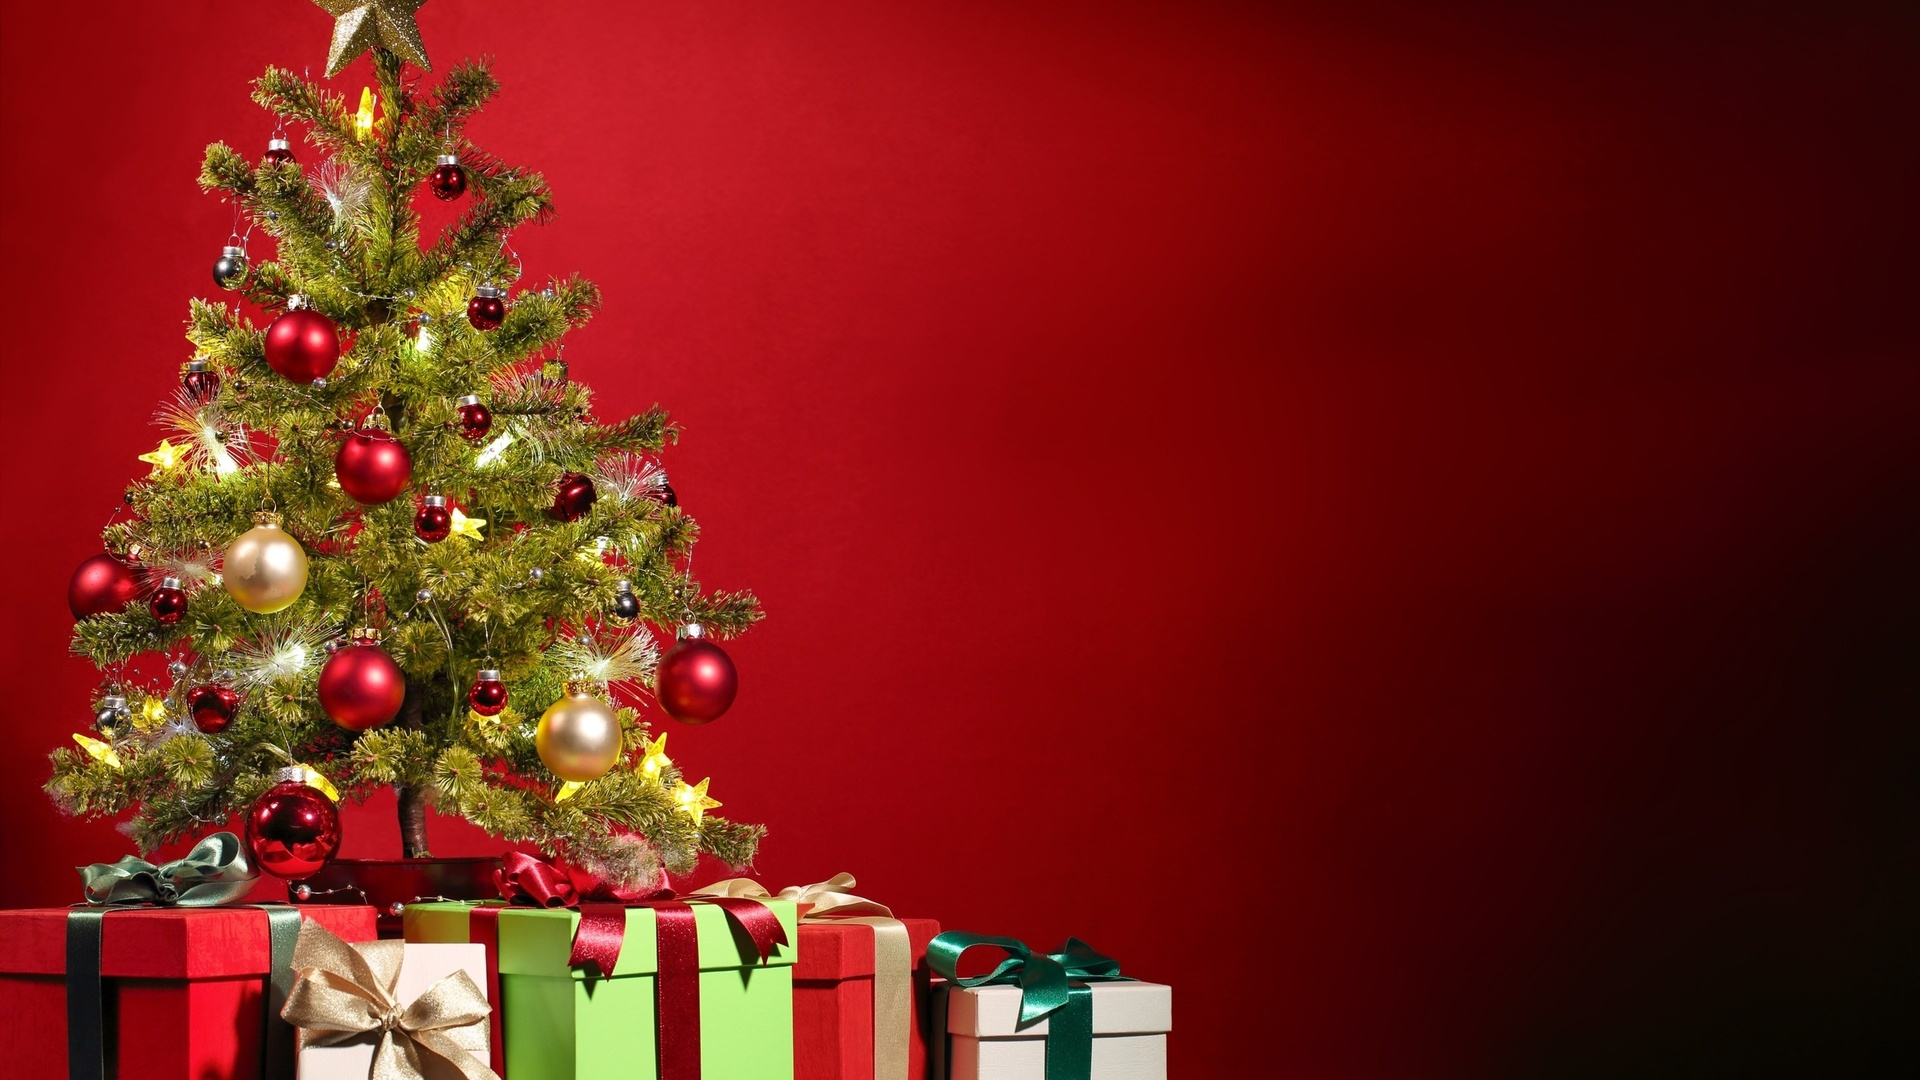 Beautiful Christmas Tree Wallpapers 54 1920x1080